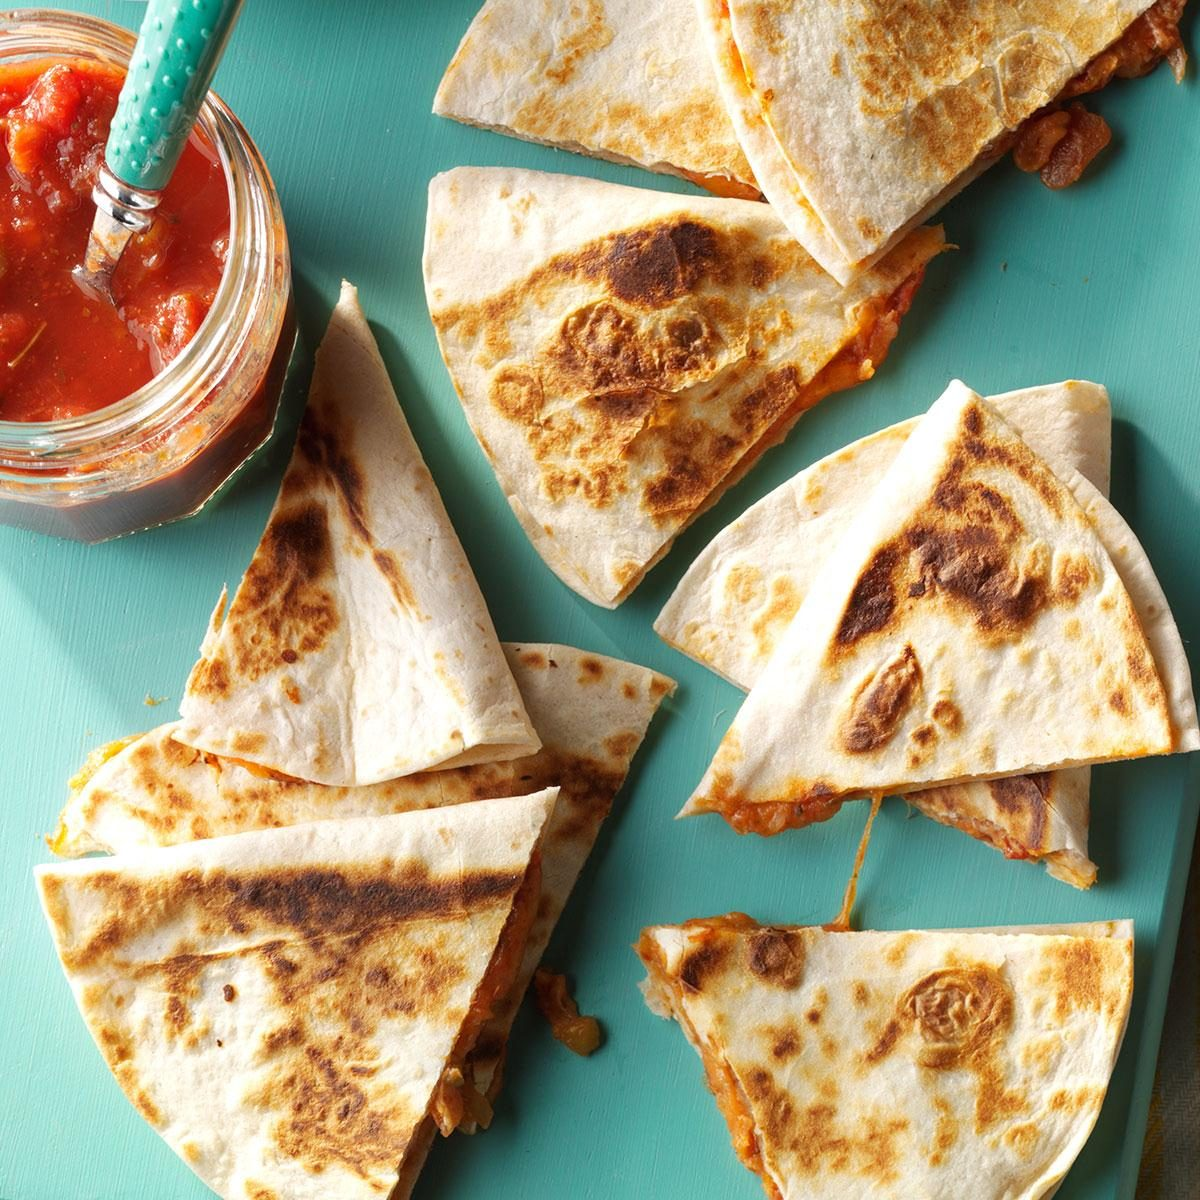 Blue apron quesadilla recipe - Blue Apron Quesadilla Recipe 70